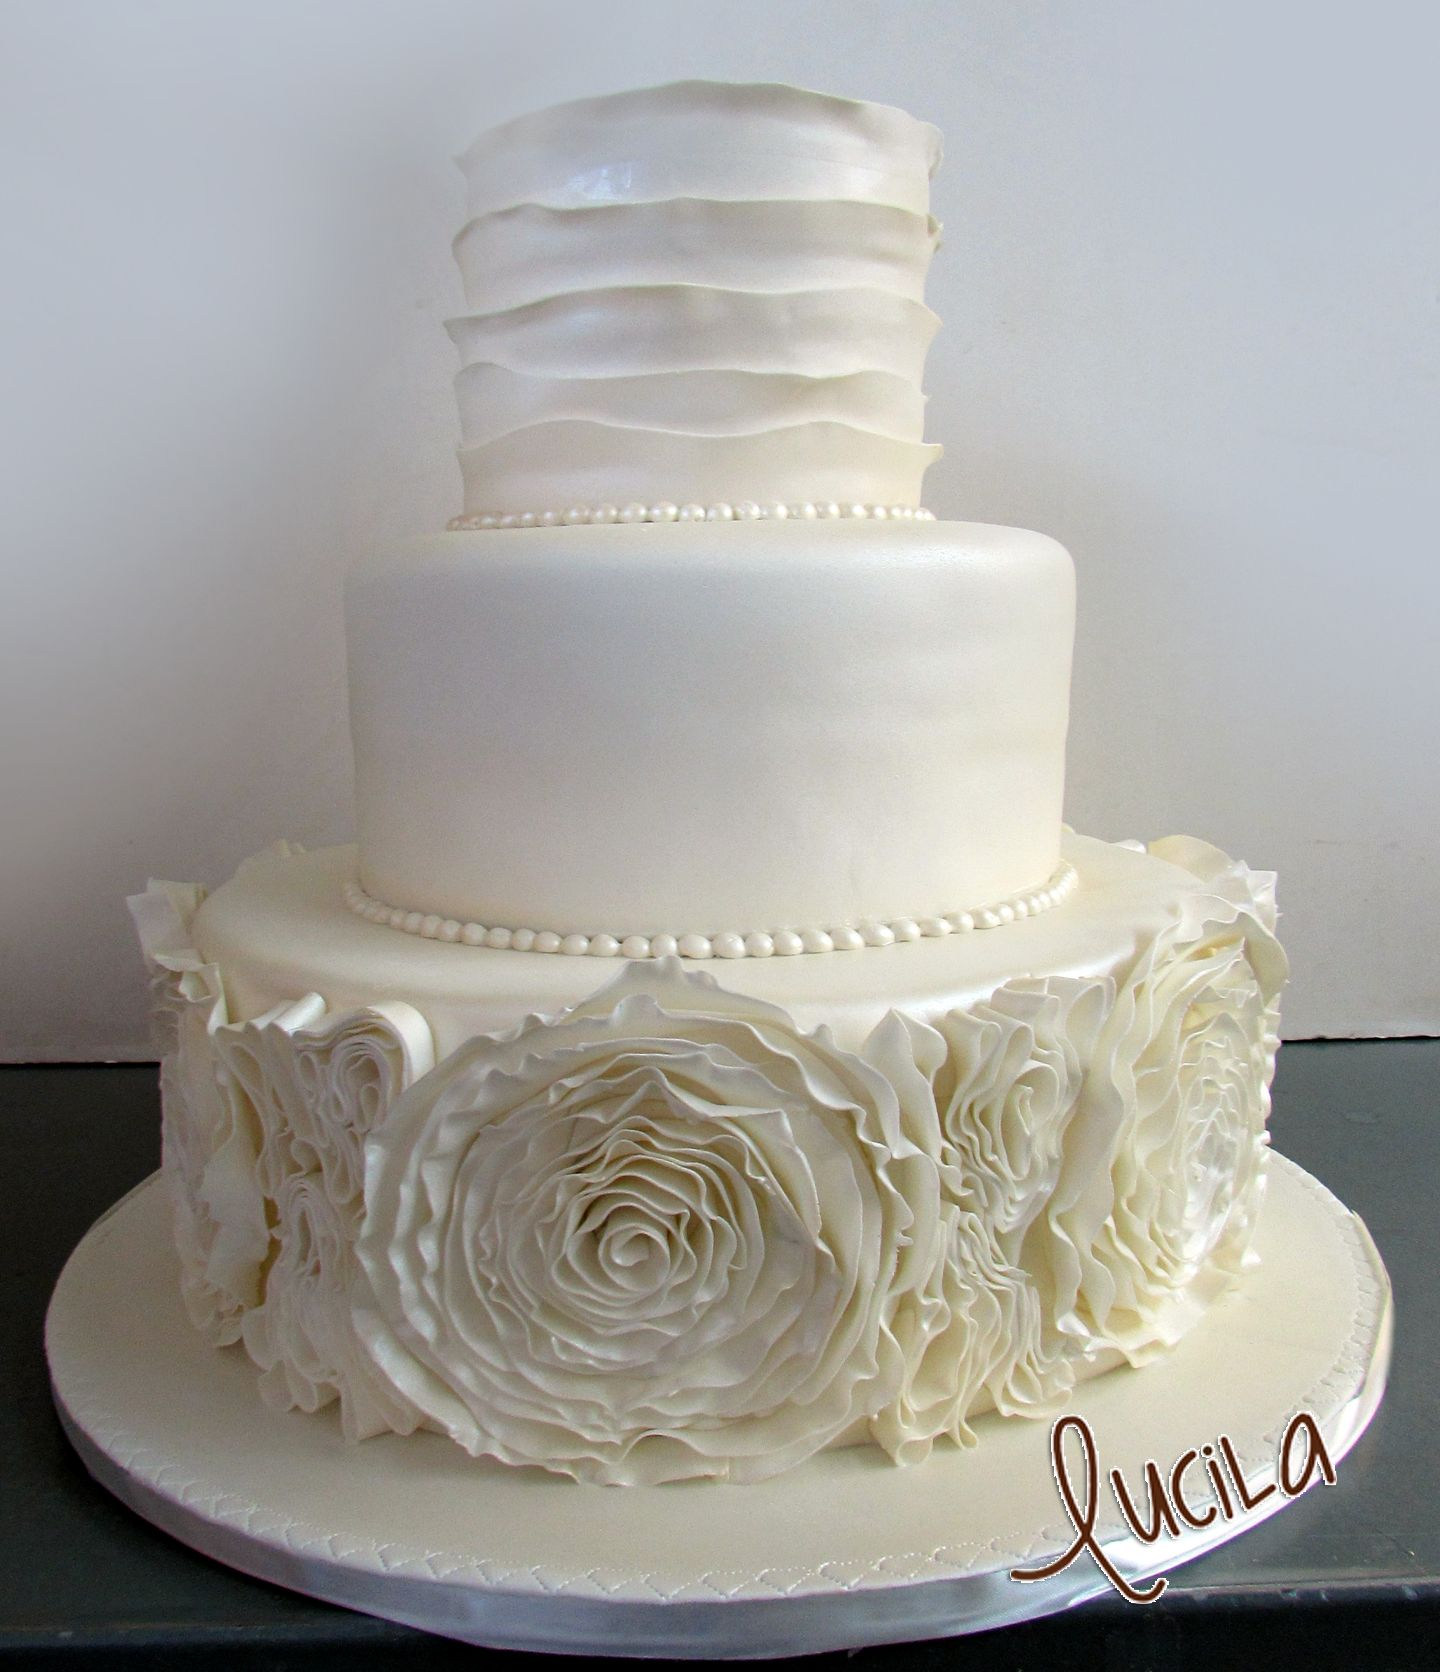 Three tier wedding cake showing a stylish trendy design Wedding